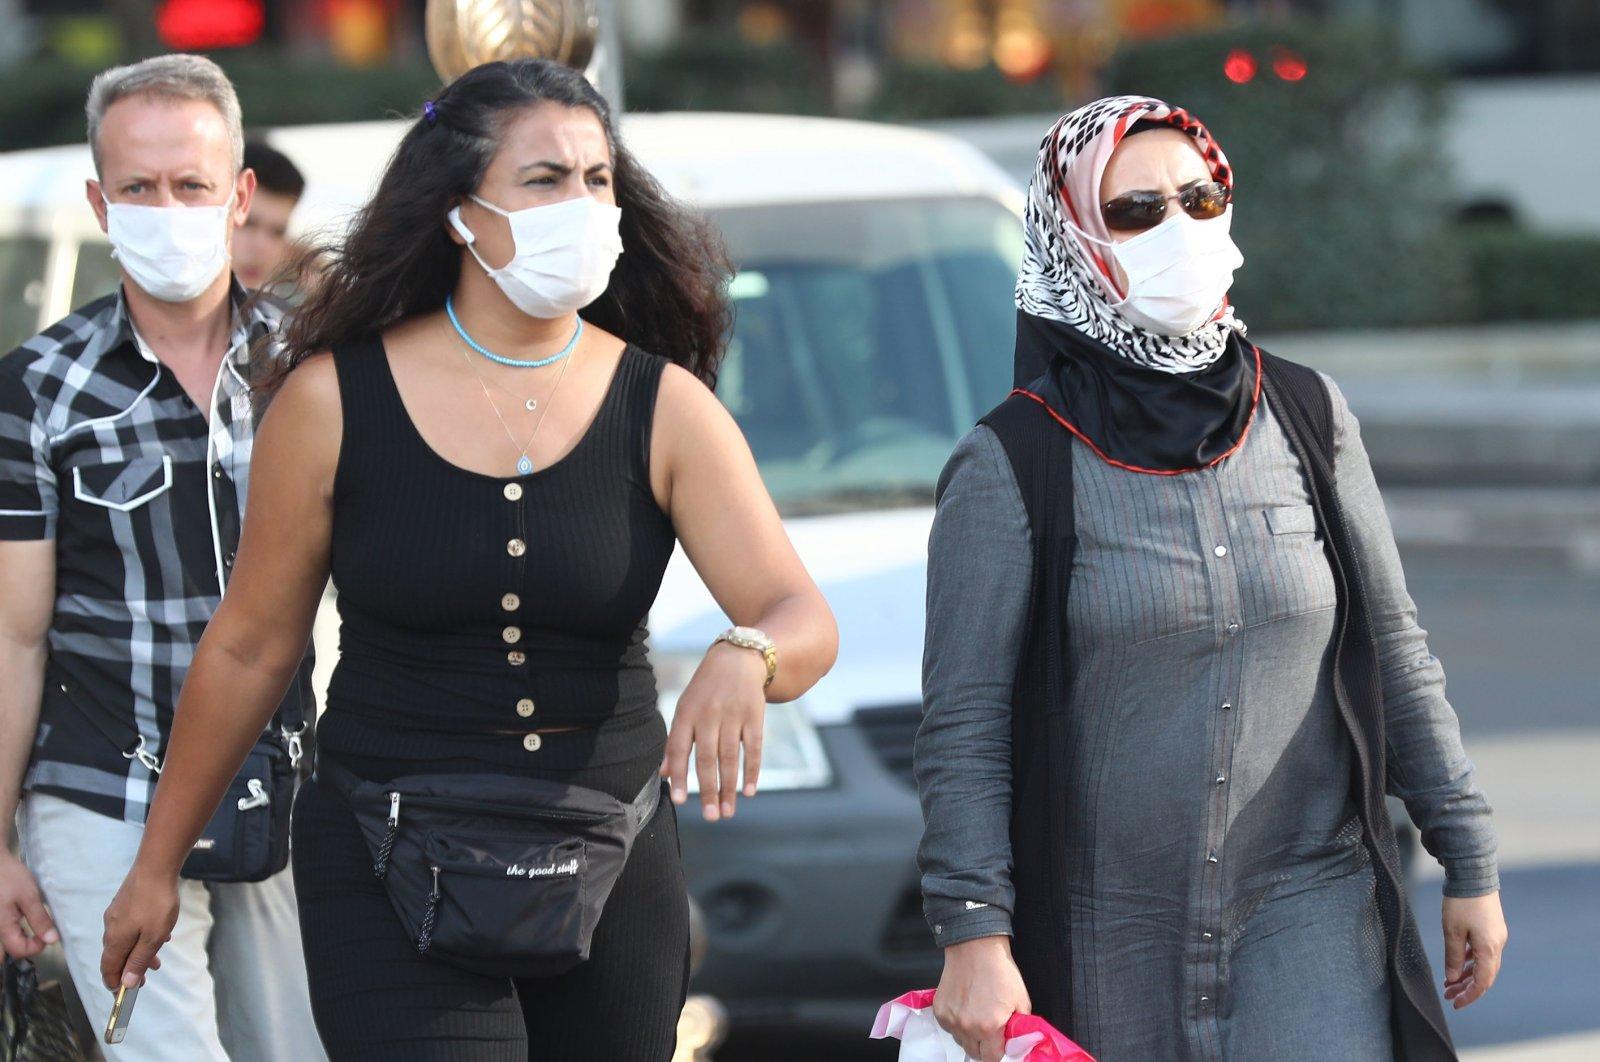 People wearing masks walk along a street in the capital Ankara, Turkey, Sept. 18, 2020. (AFP Photo)